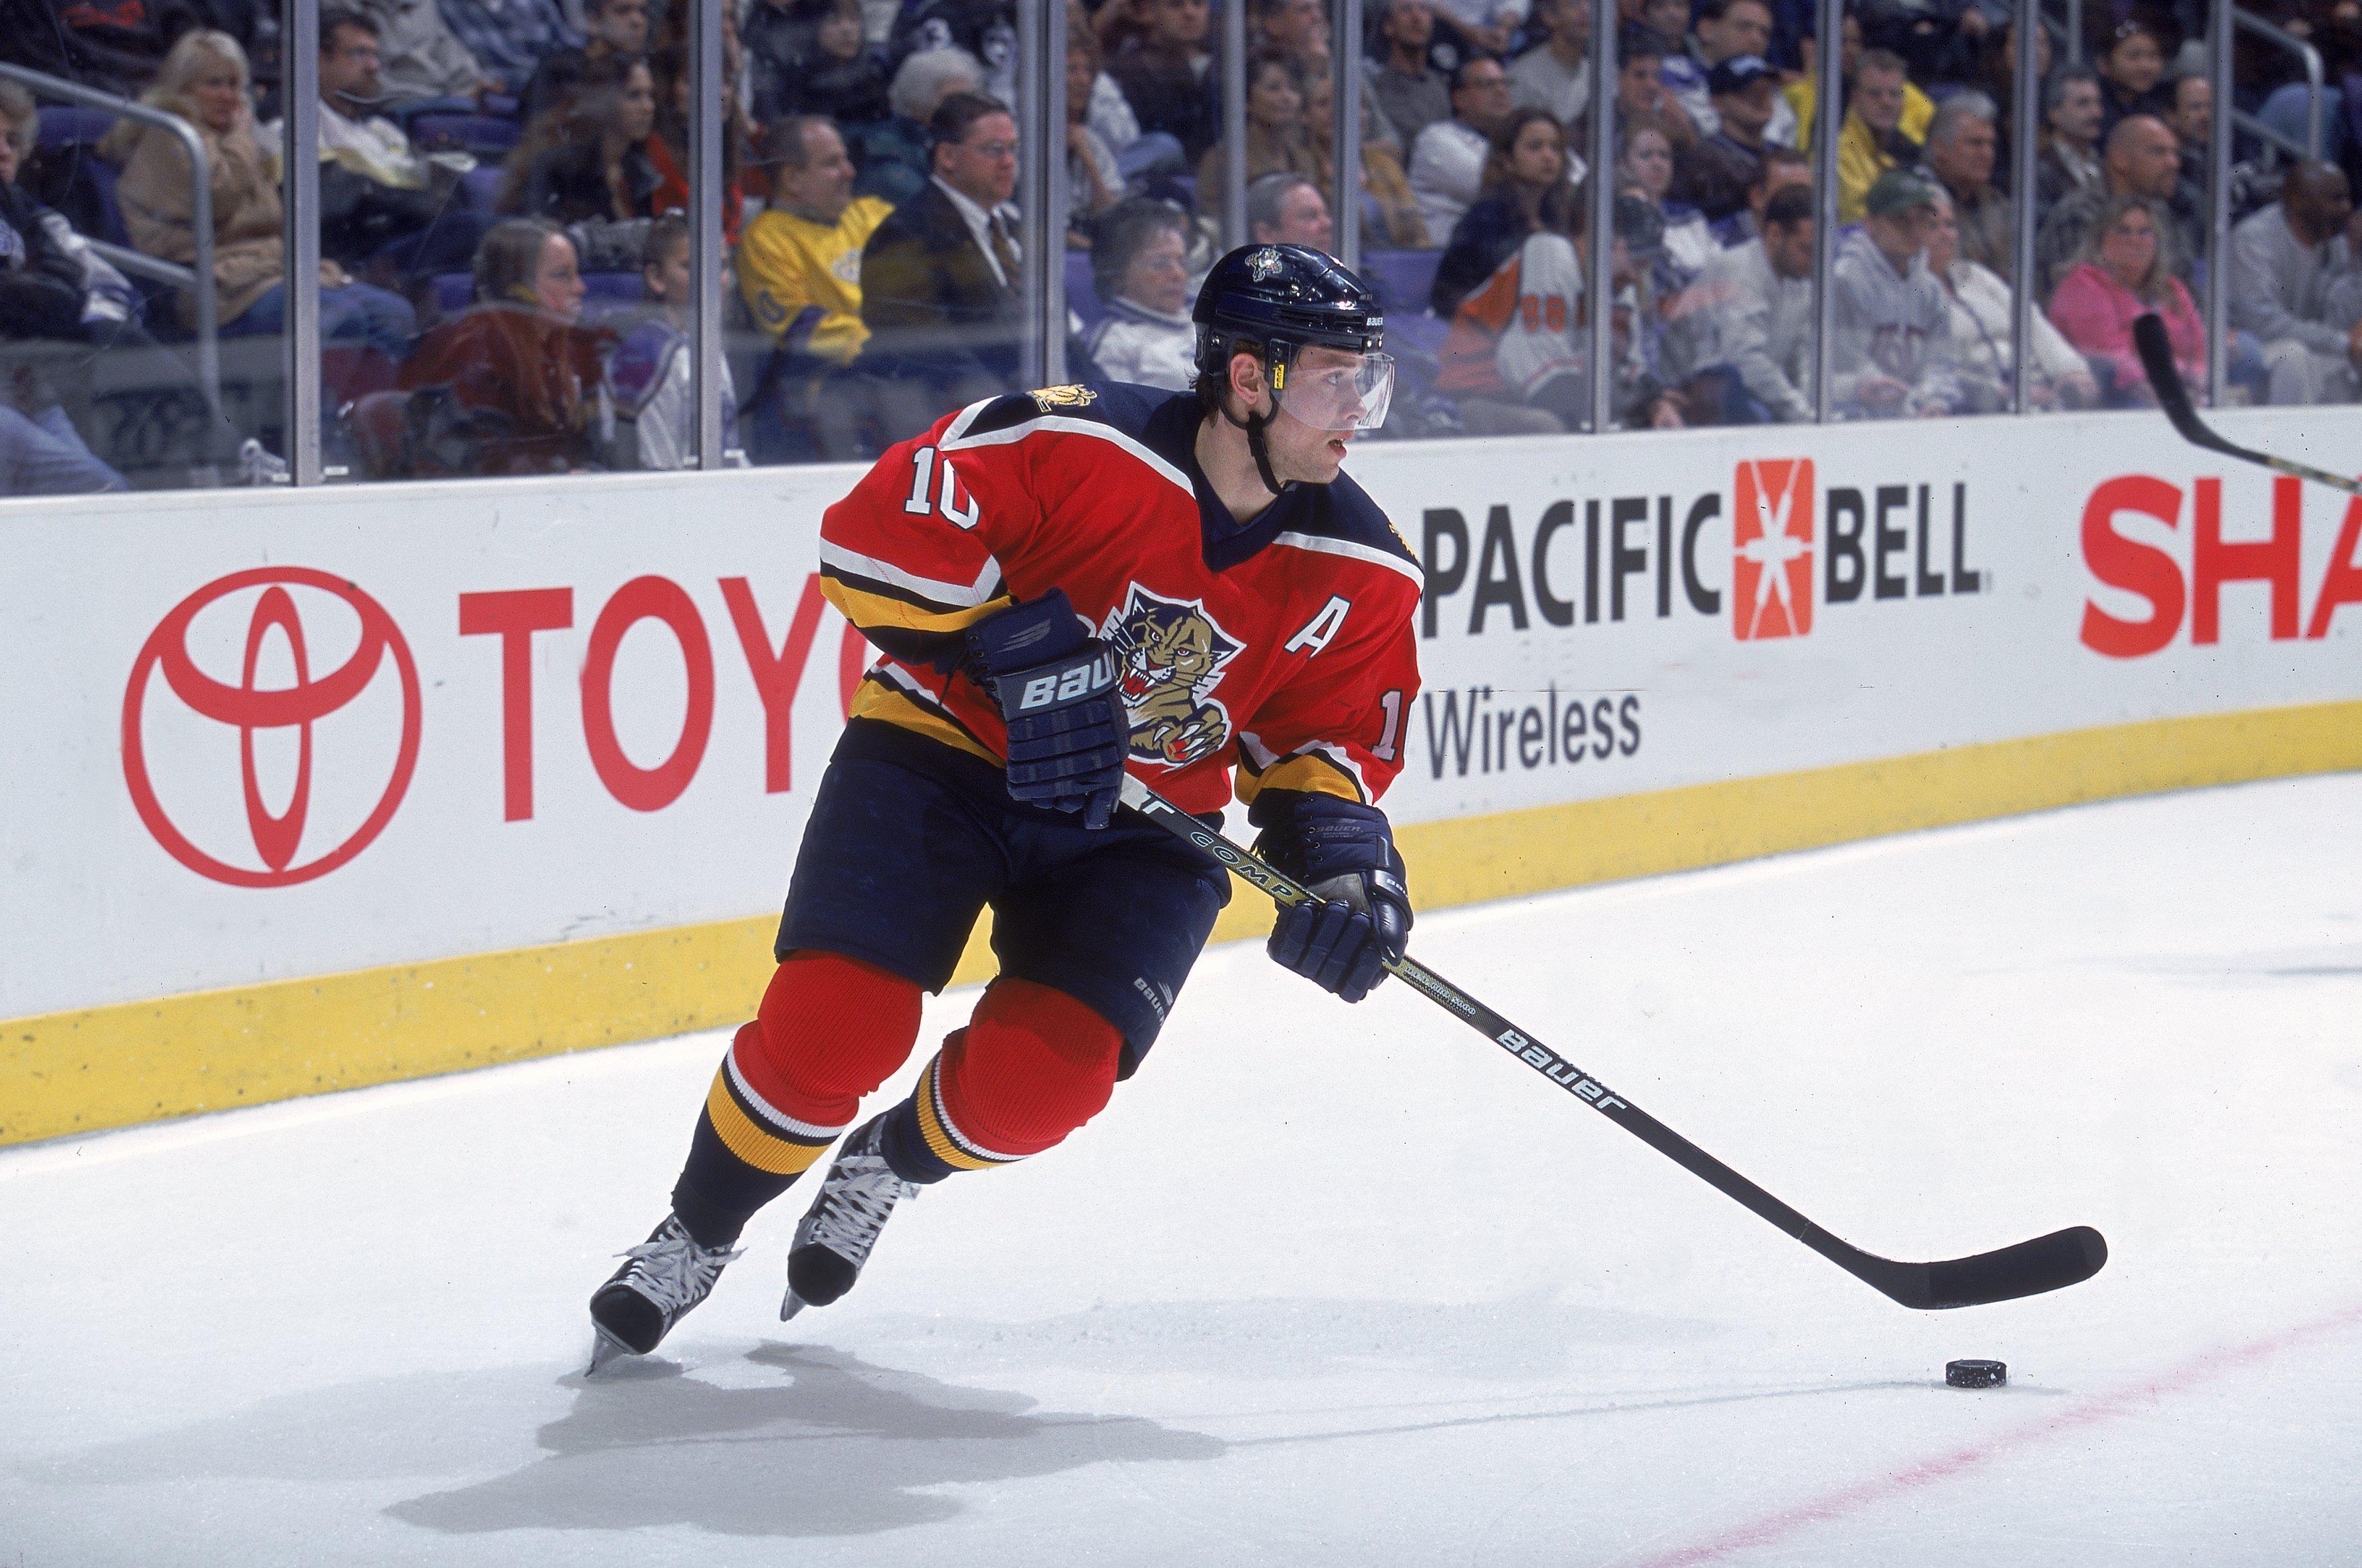 Valery Bure - talented NHL forward 2